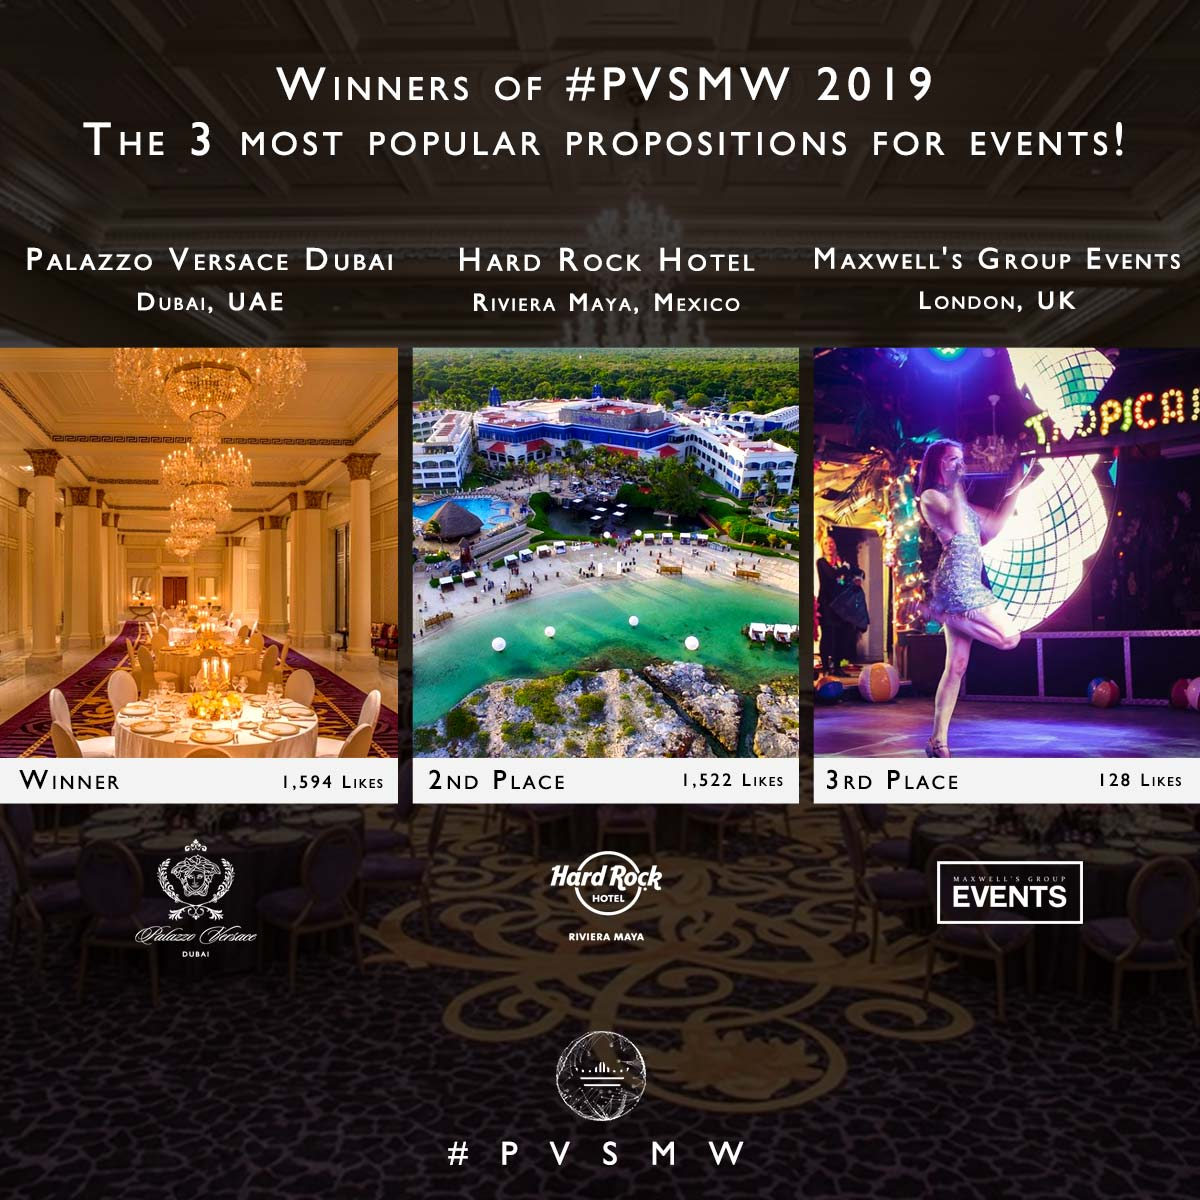 Prestigious Venues Social Media Week 2019 Results, PVSMW Winners